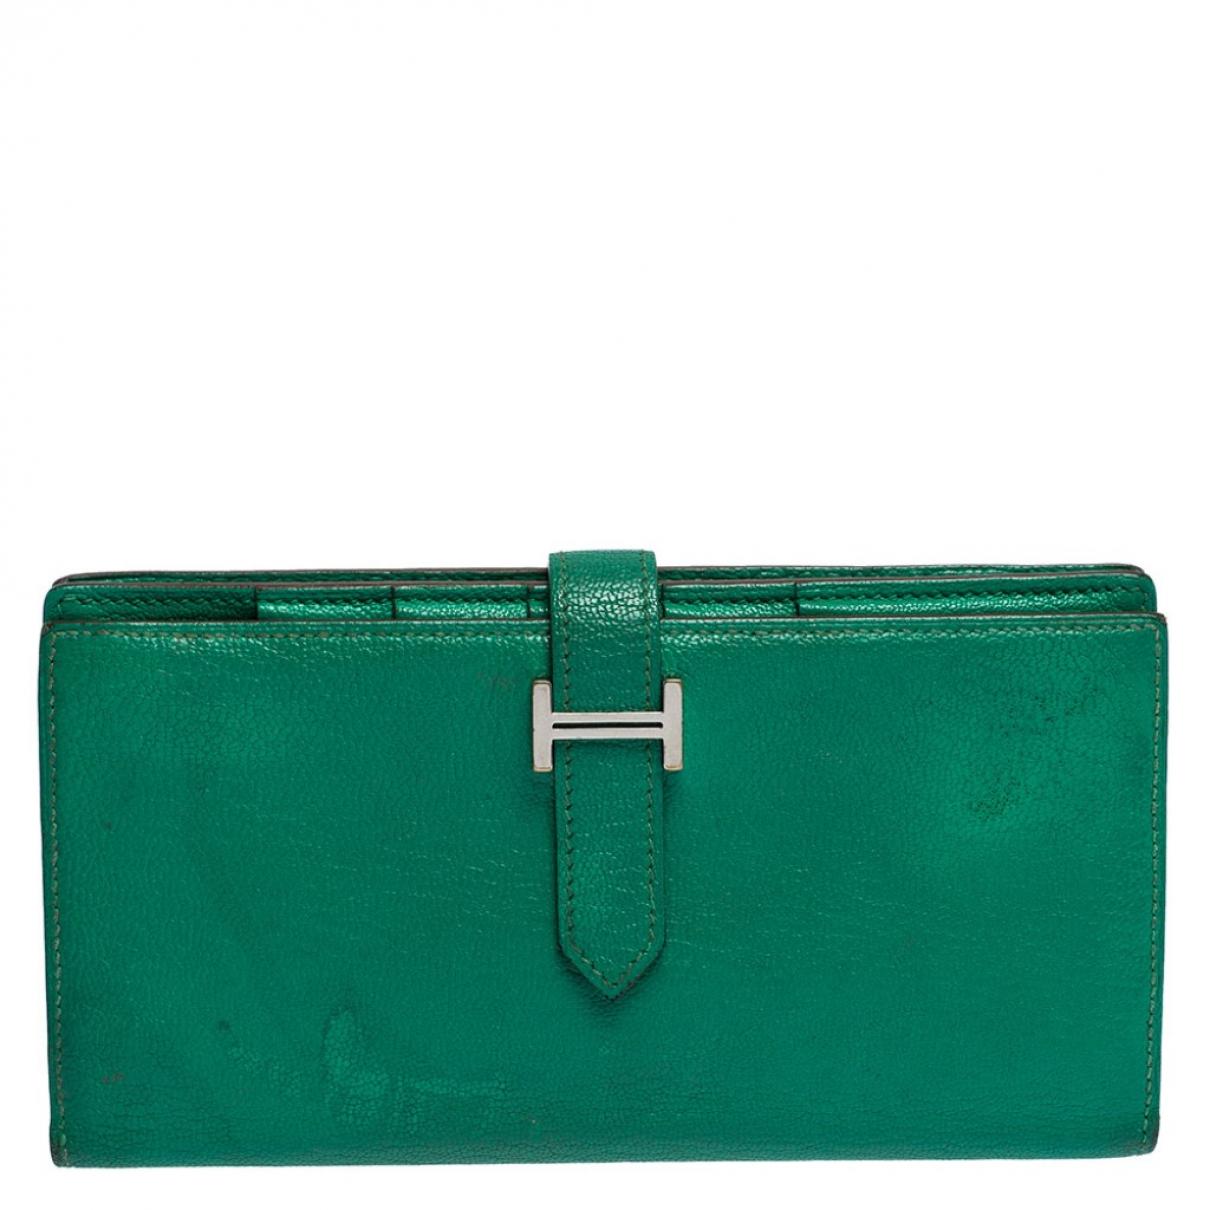 Hermès Béarn Green Leather wallet for Women N